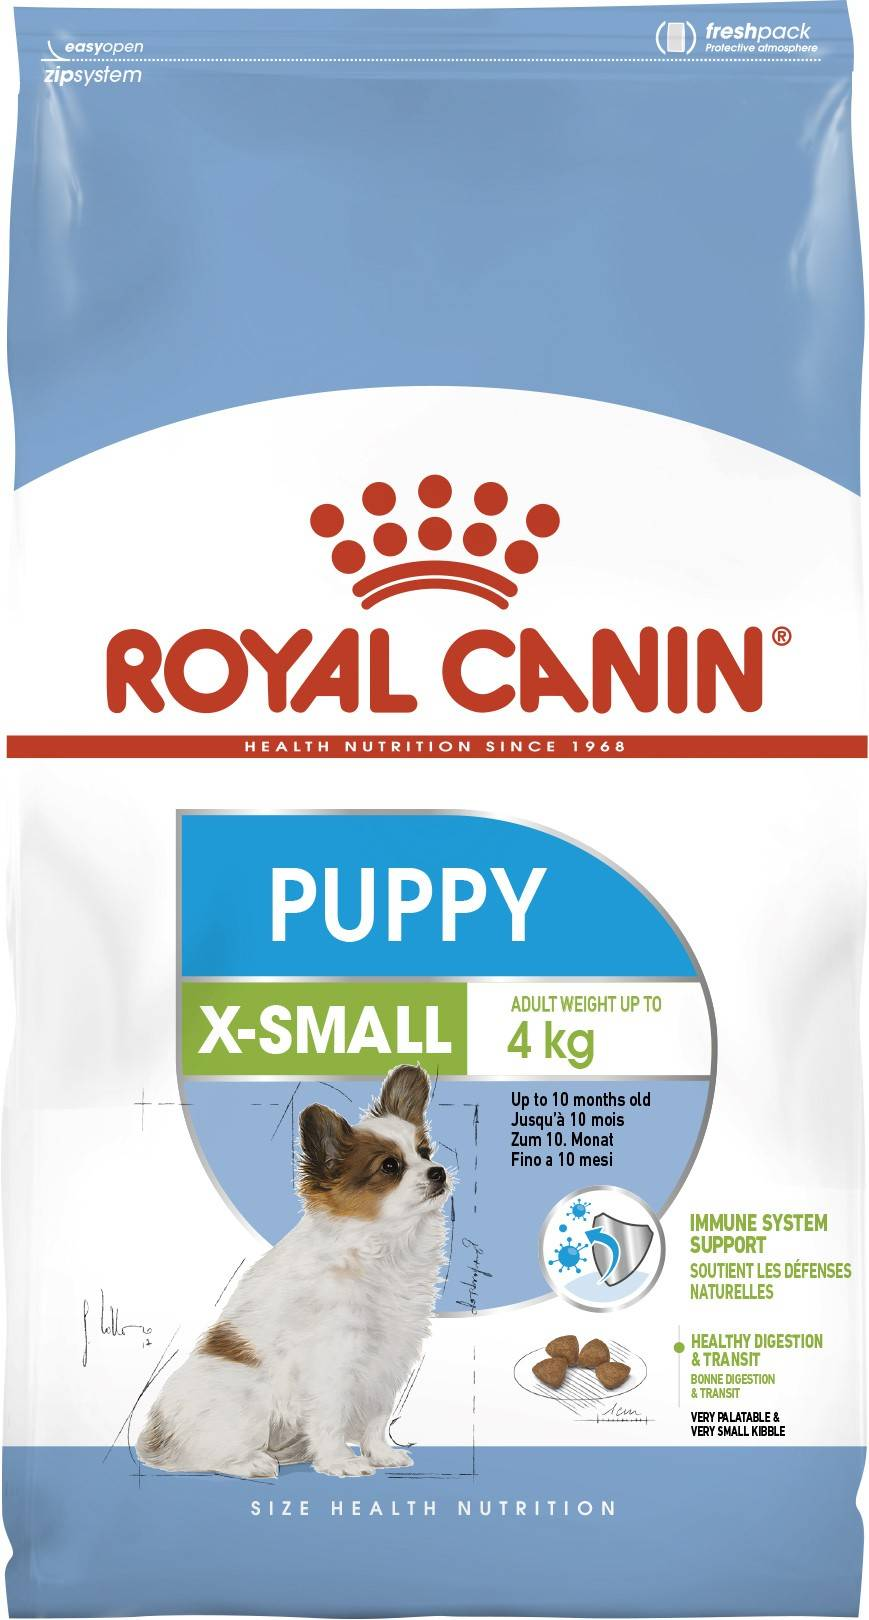 ROYAL CANIN X-SMALL PUPPY – сухой корм для щенков миниатюрных пород